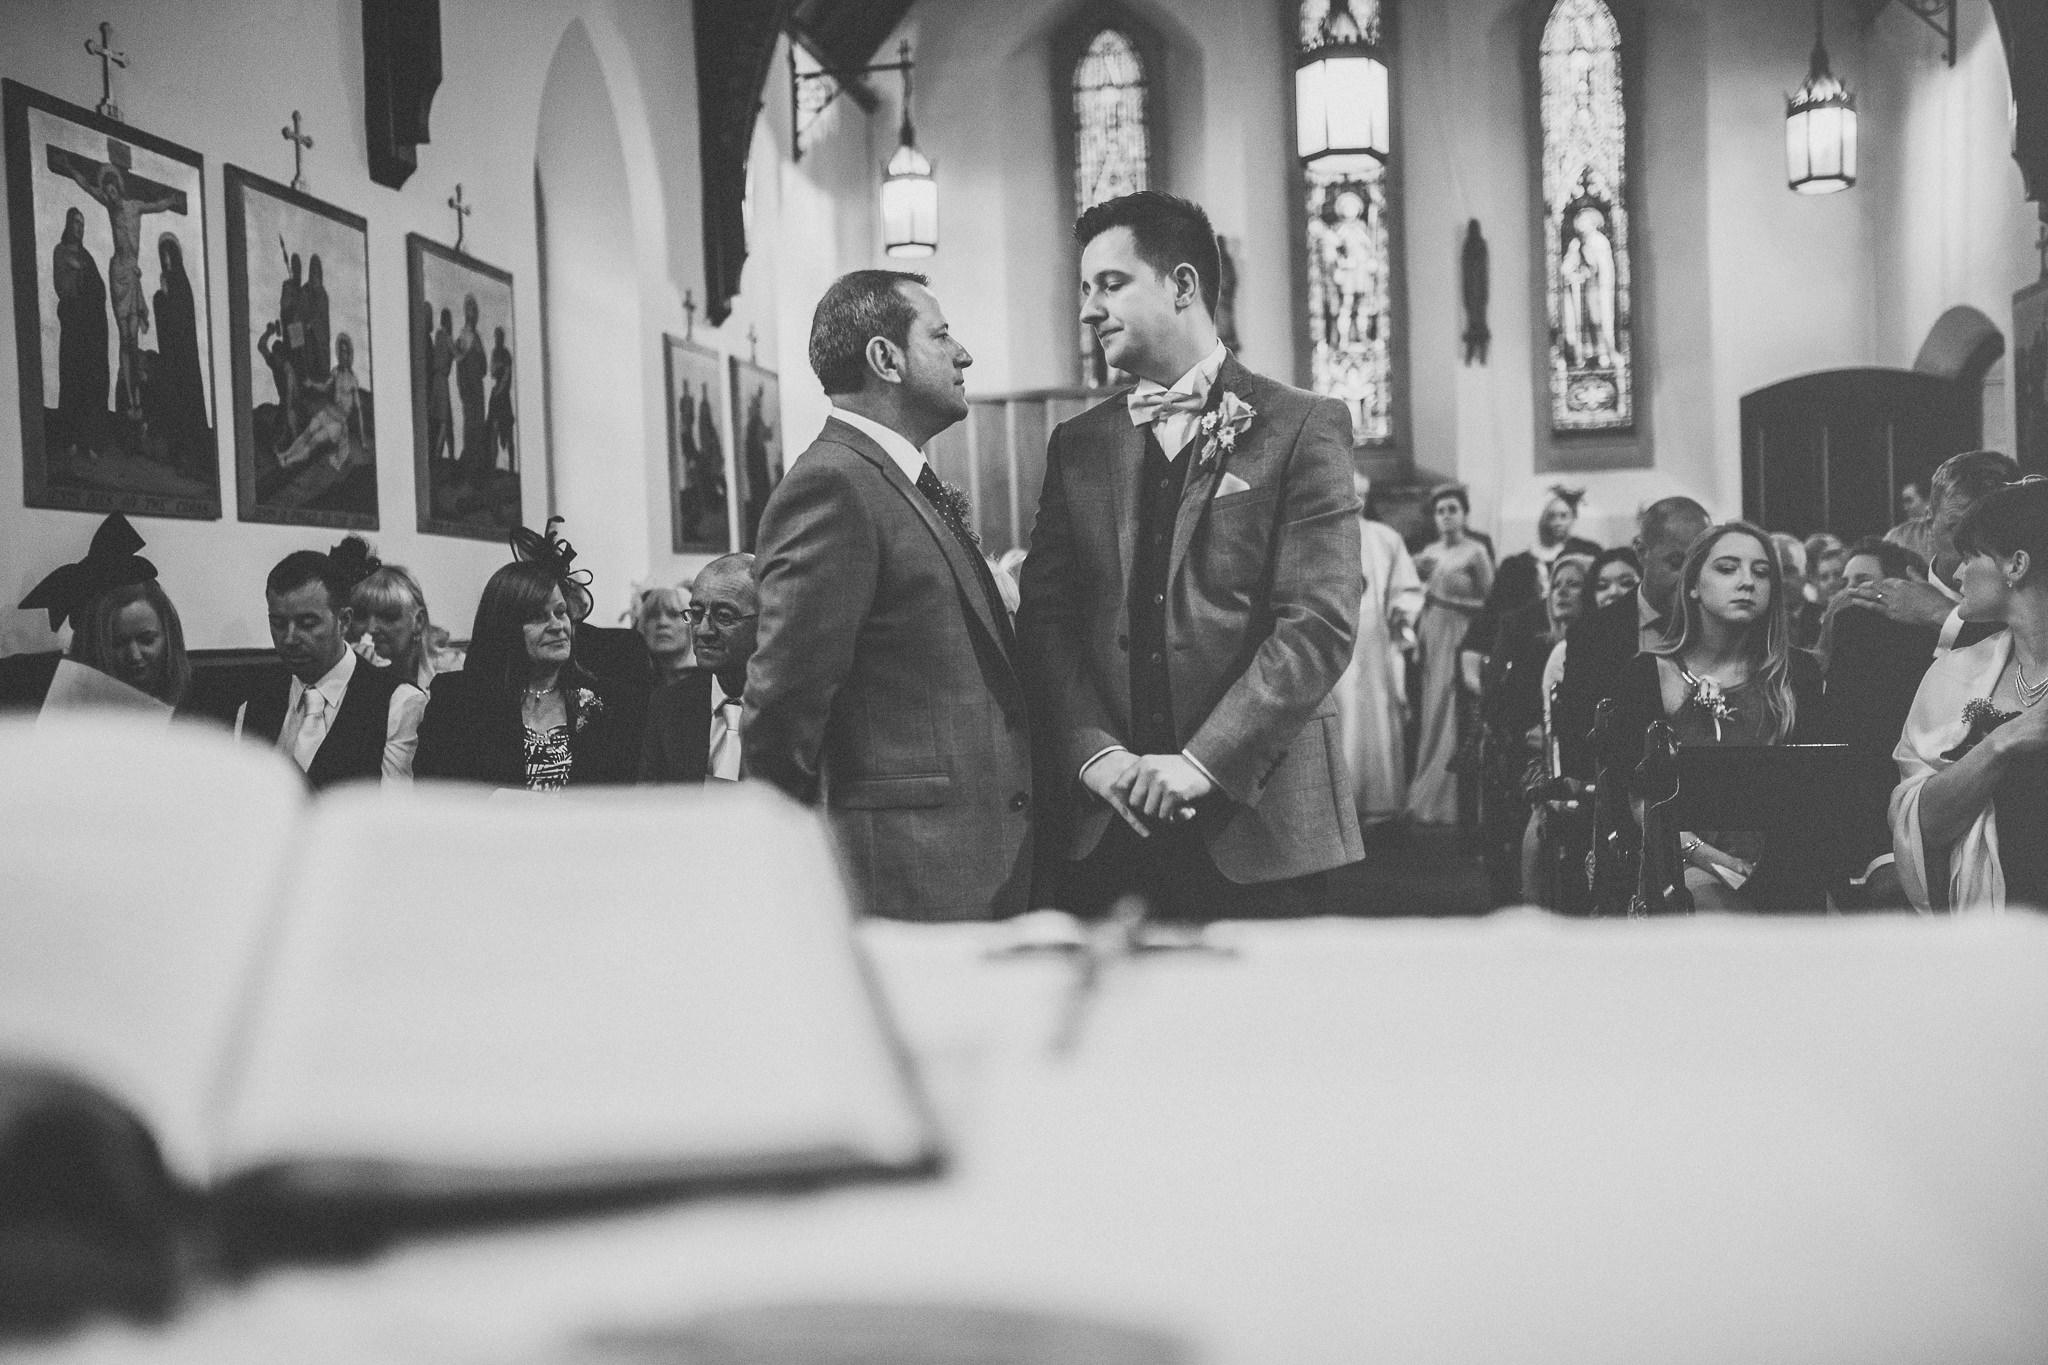 Lancashire-Creative-natural-documentary-wedding-photography-90026